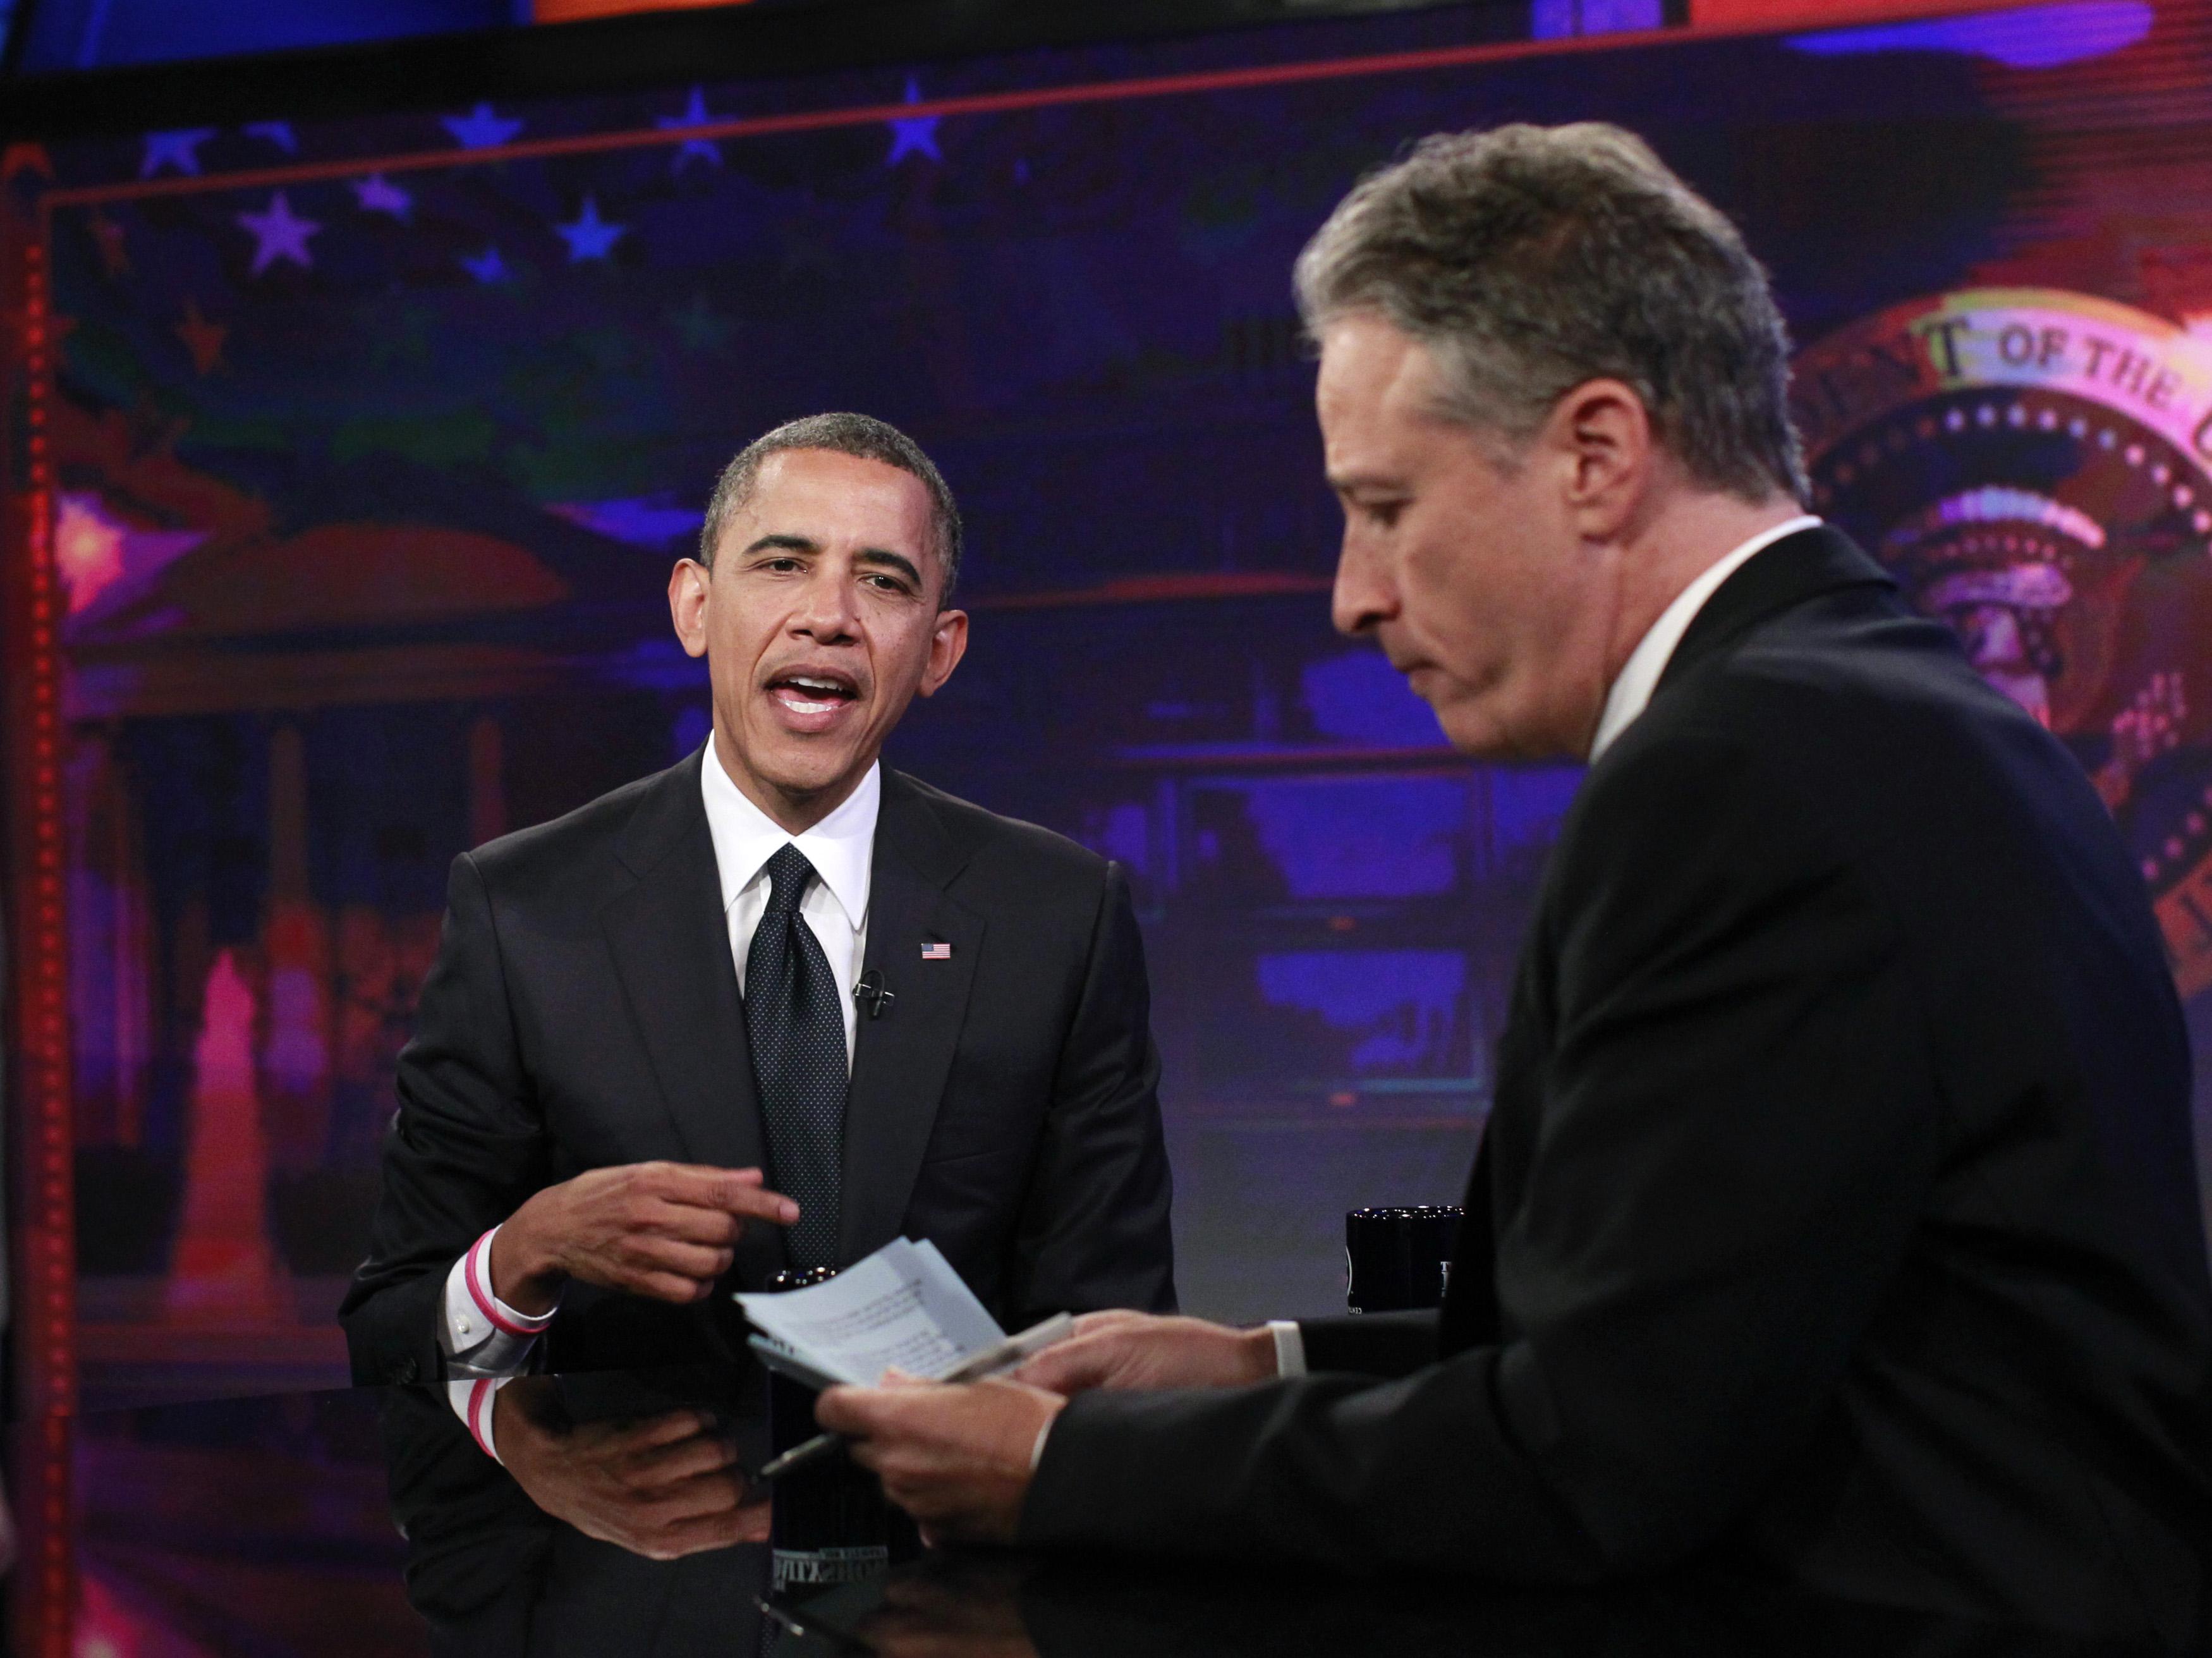 Jon Stewart interviews President Barack Obama in 2012.